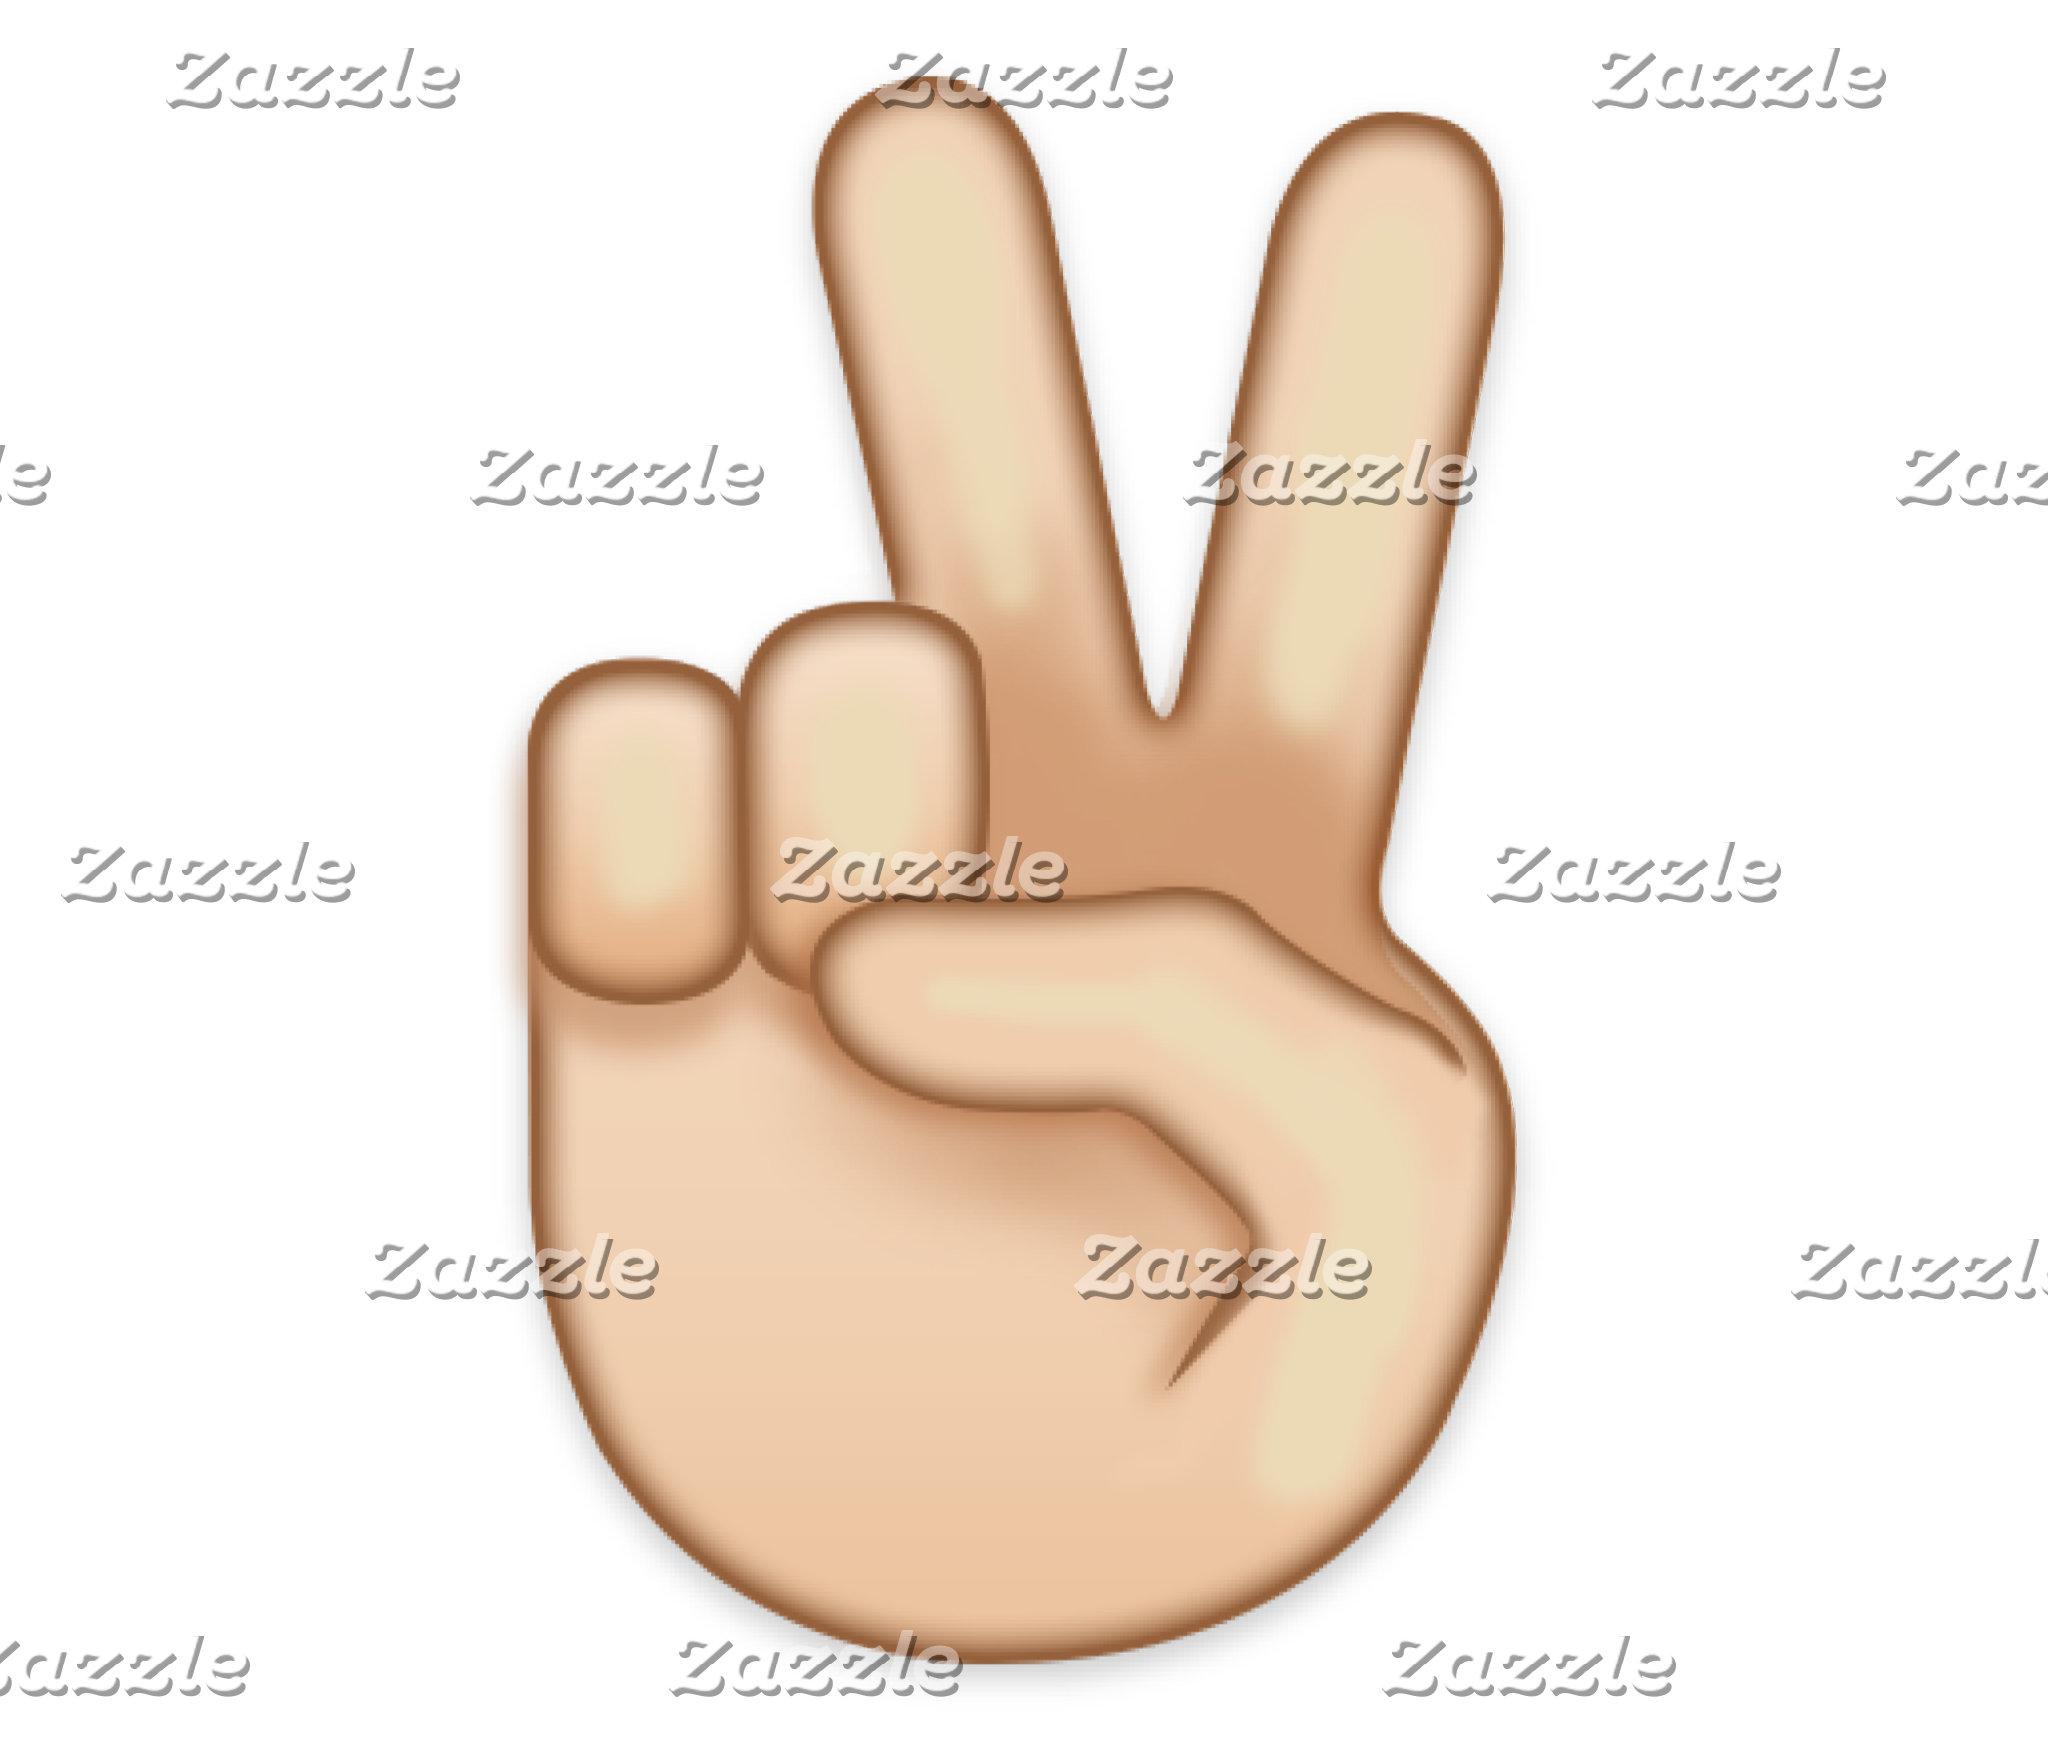 ✌️ VICTORY HAND